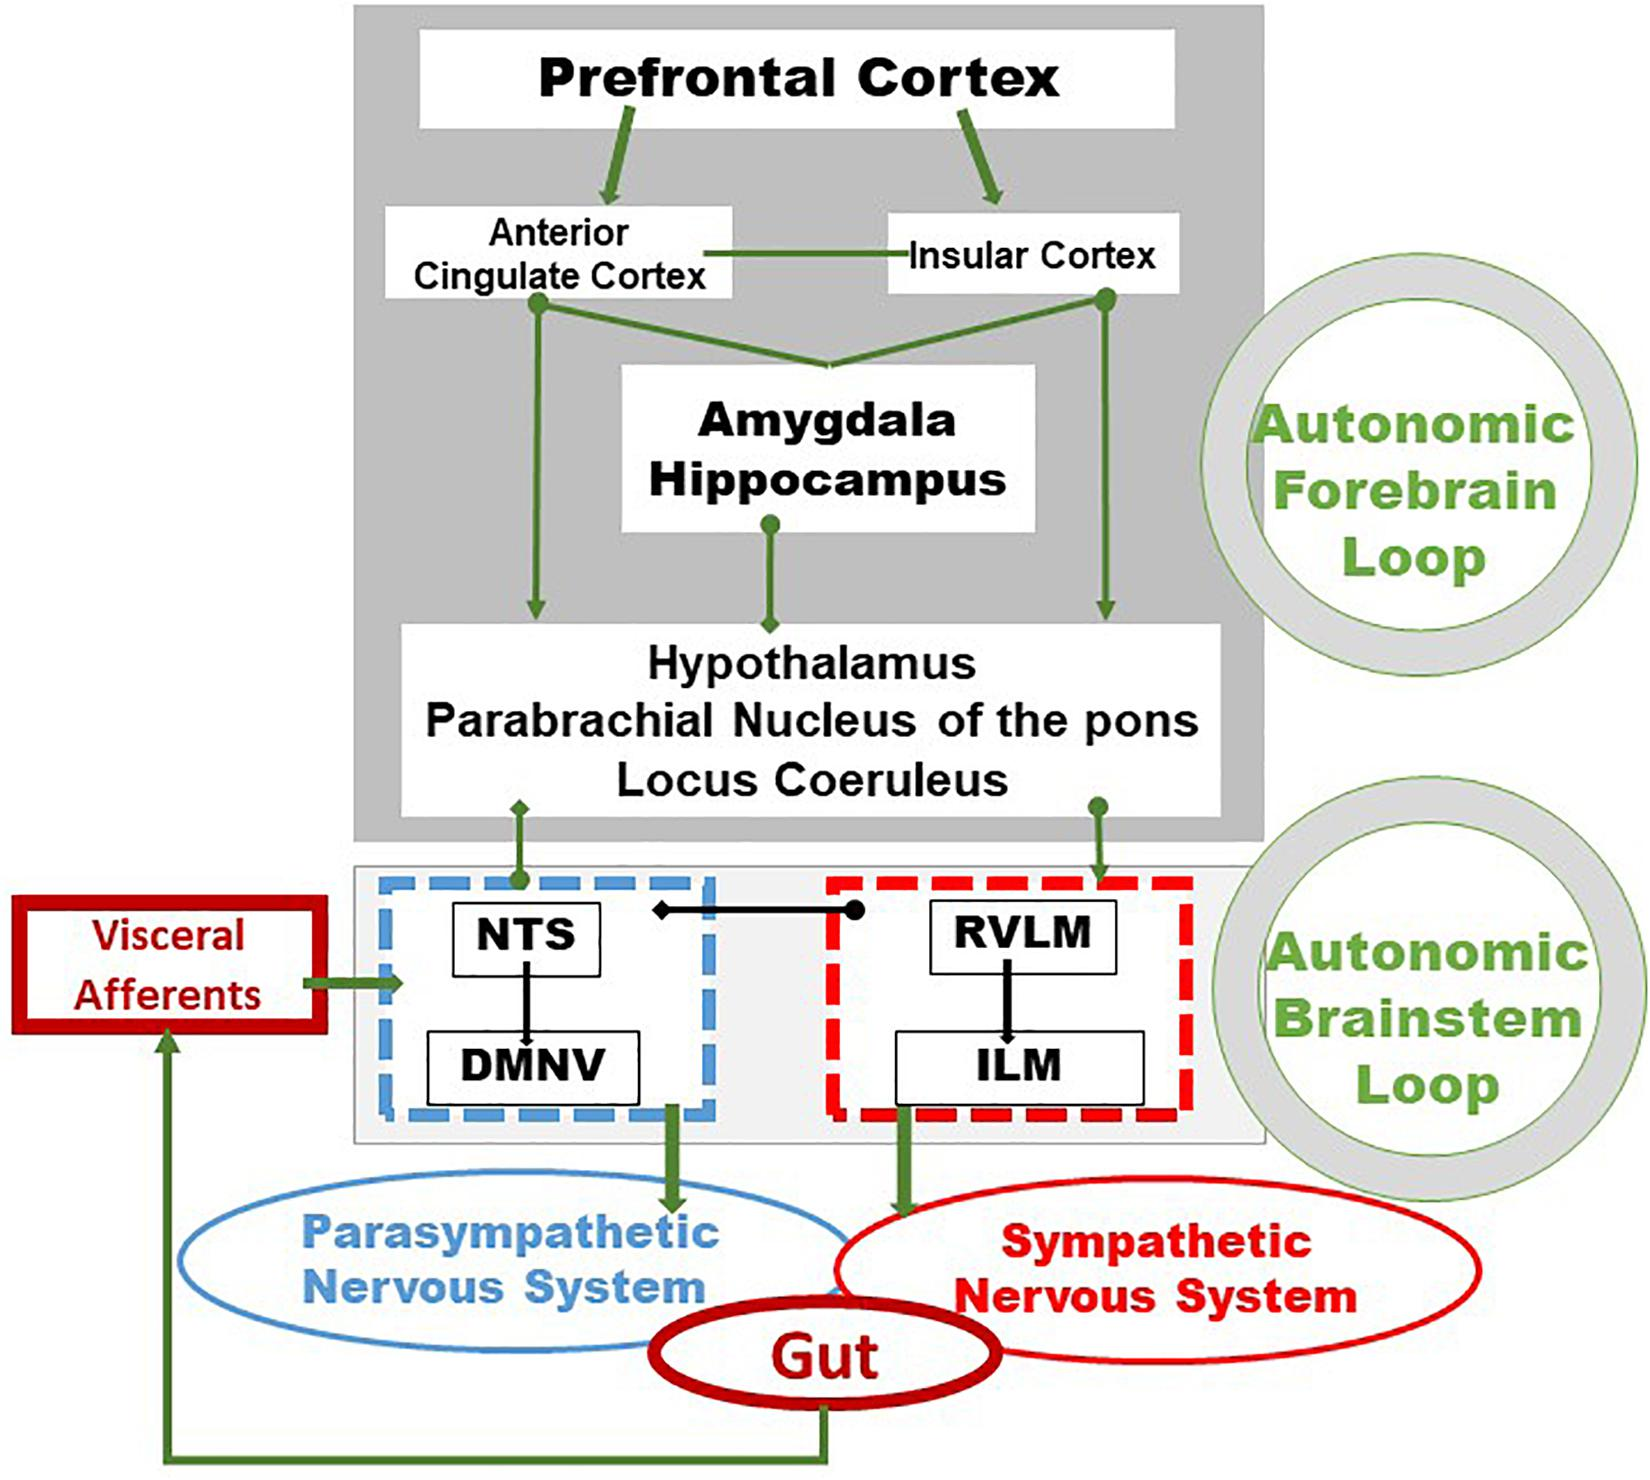 autonóm hipertónia magas vérnyomás proteinuria ödéma jellemző